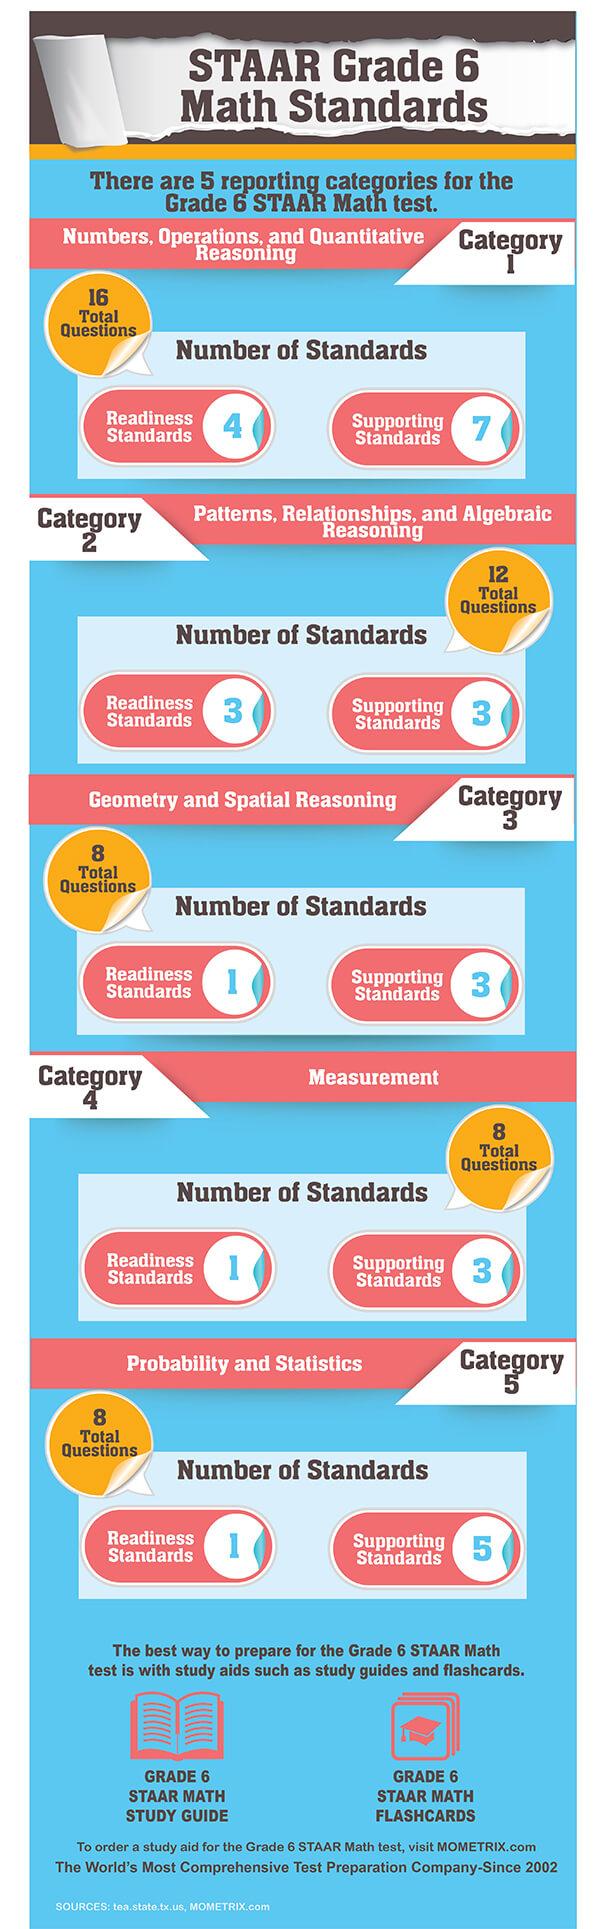 medium resolution of STAAR Mathematics Grade 6 Practice Test (Example Questions)